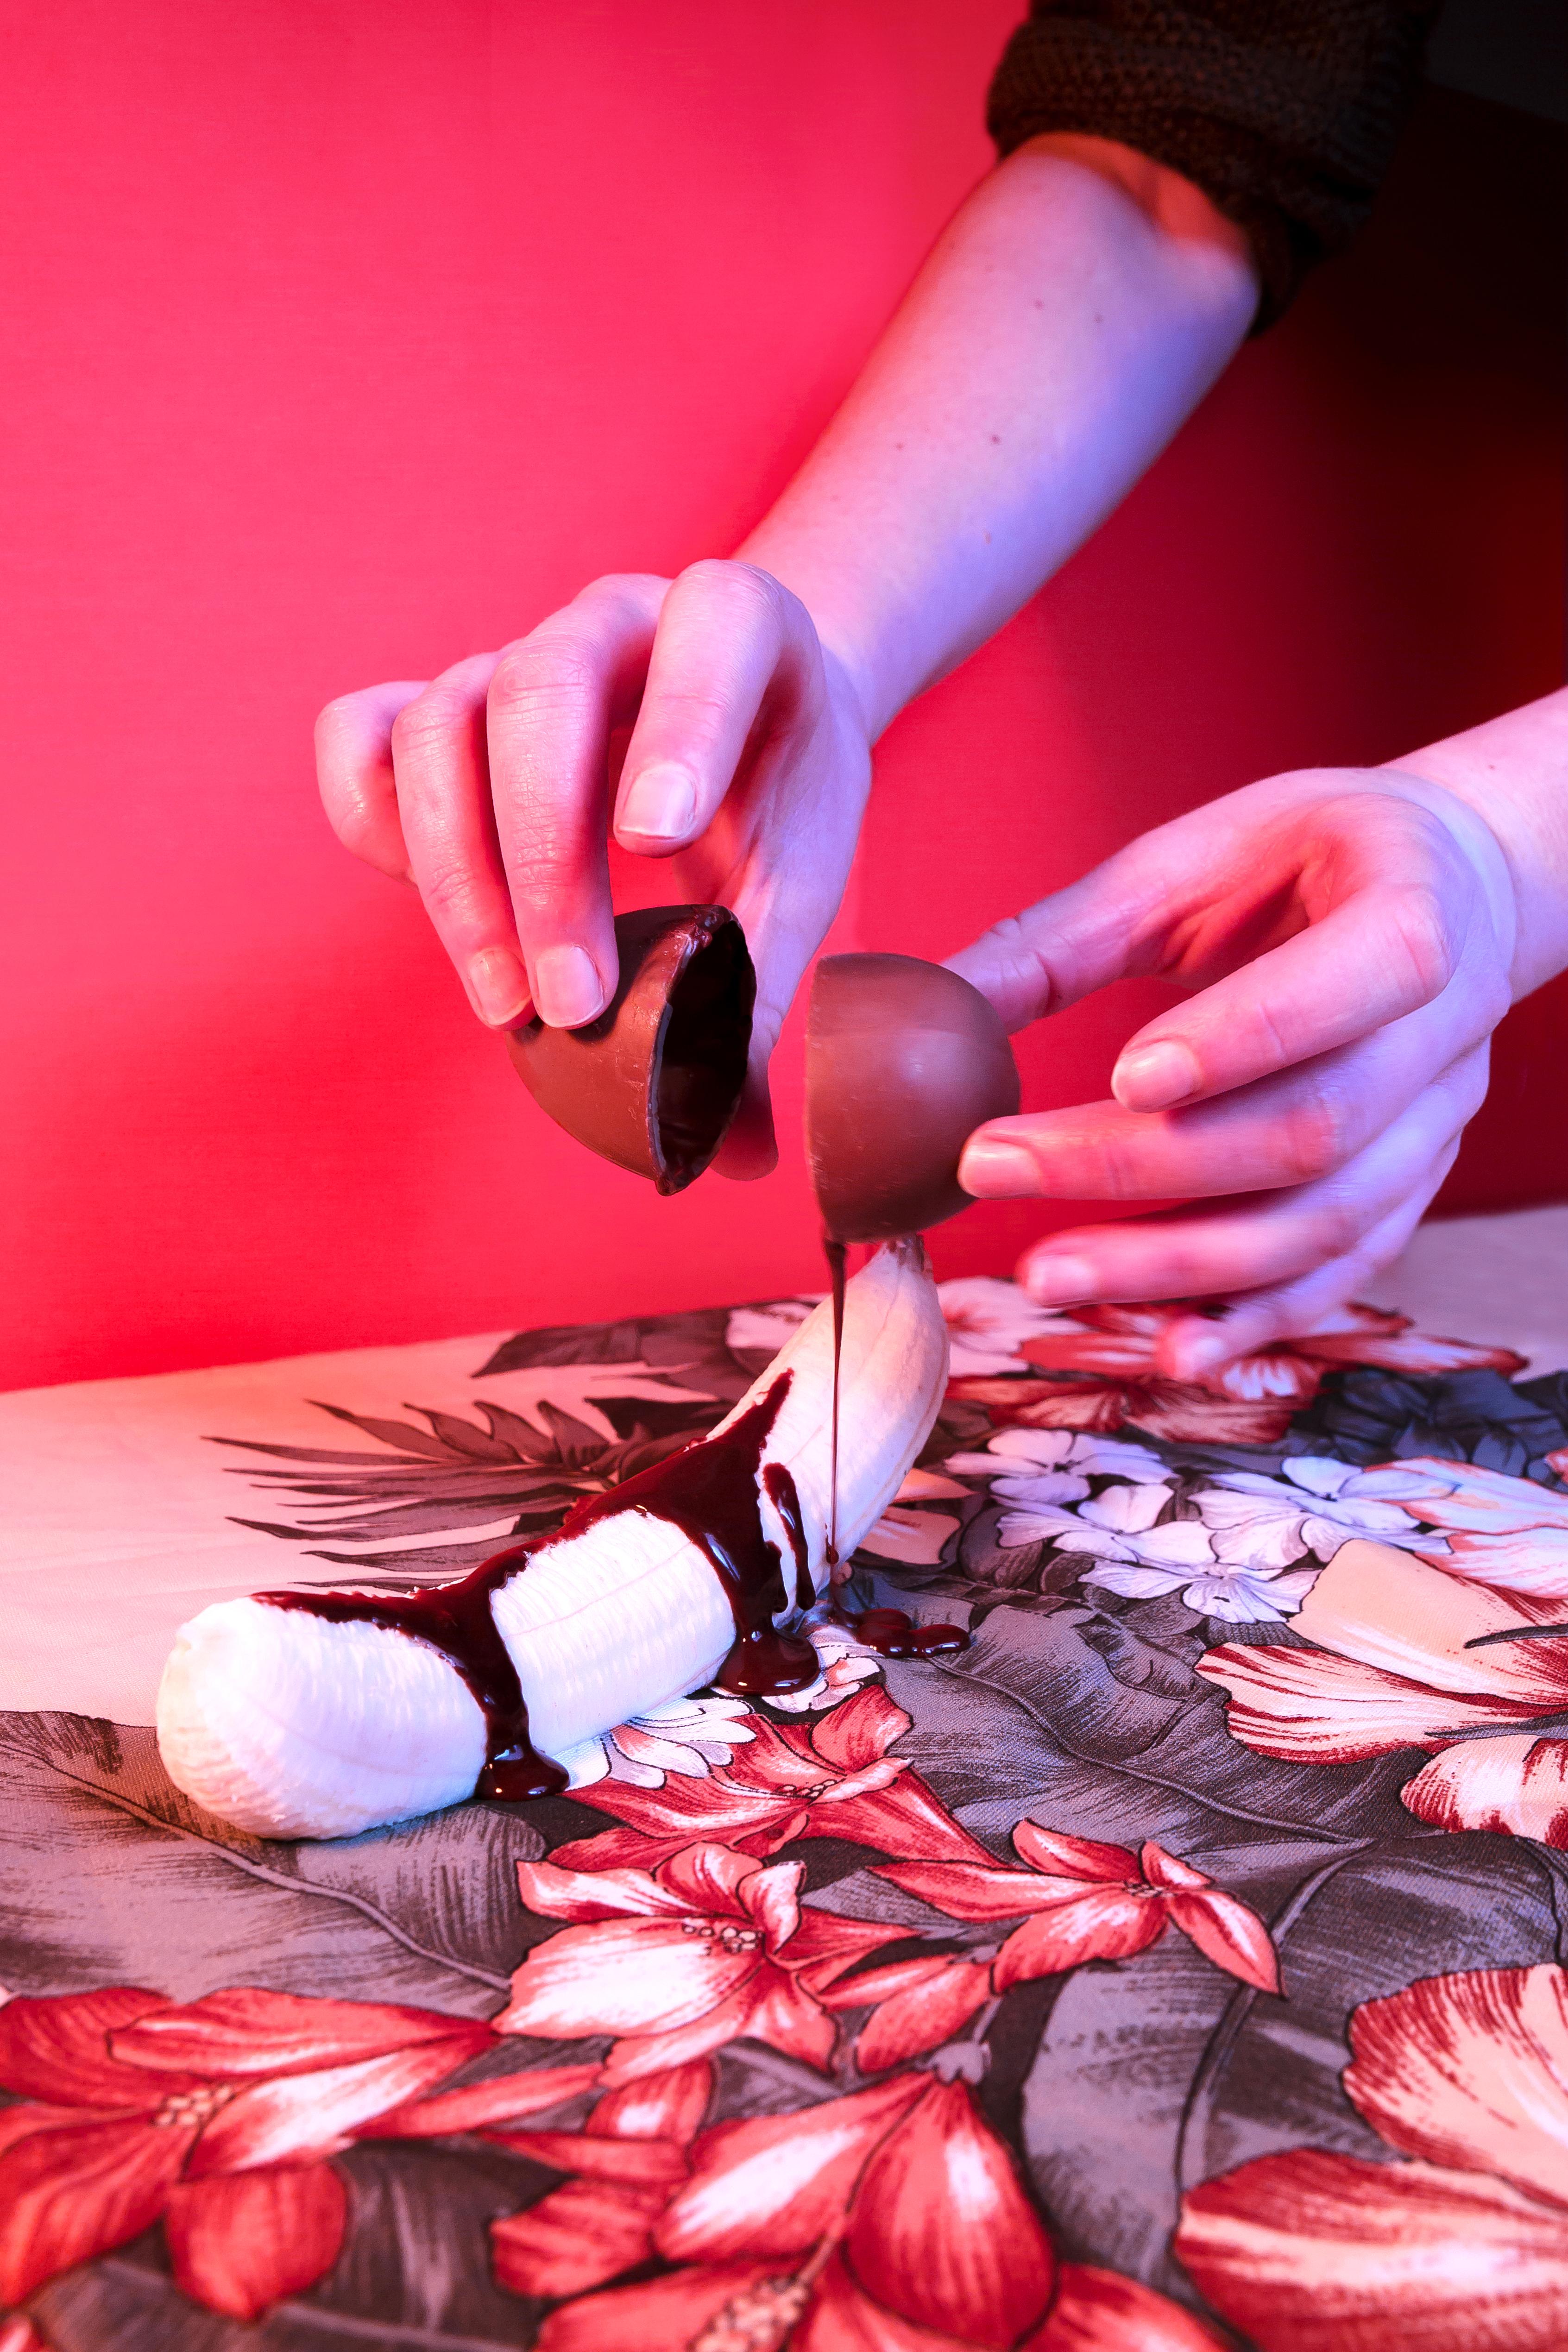 chocolat fondu sur une banane, oeuf de paques